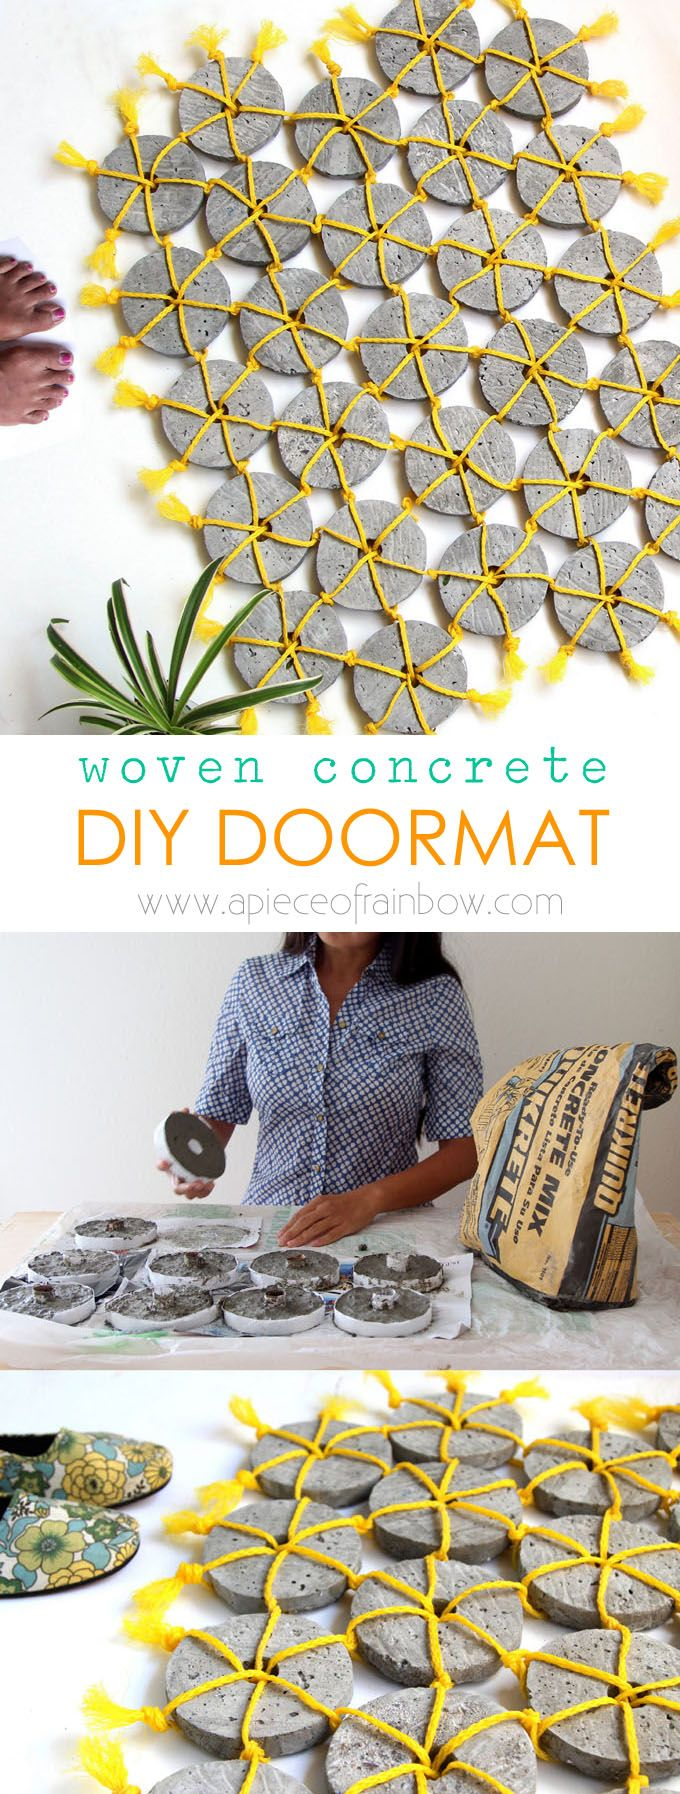 DIY-woven-concrete-doormat-apieceofrainbow (4)